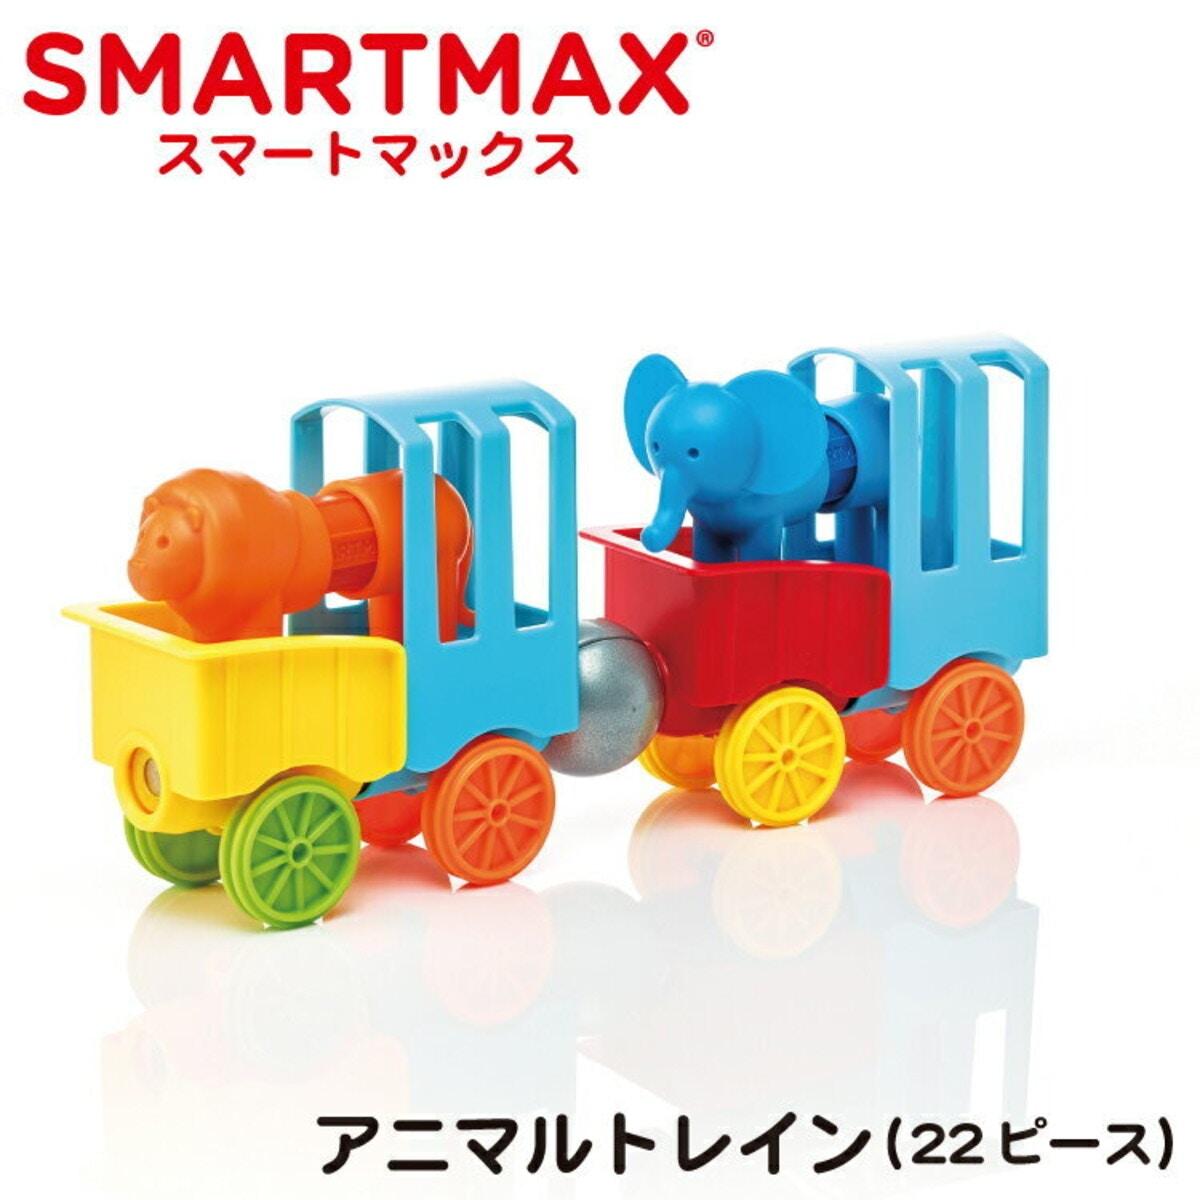 SMART MAX (スマートマックス)「はじめてのスマートマックス アニマルトレイン」